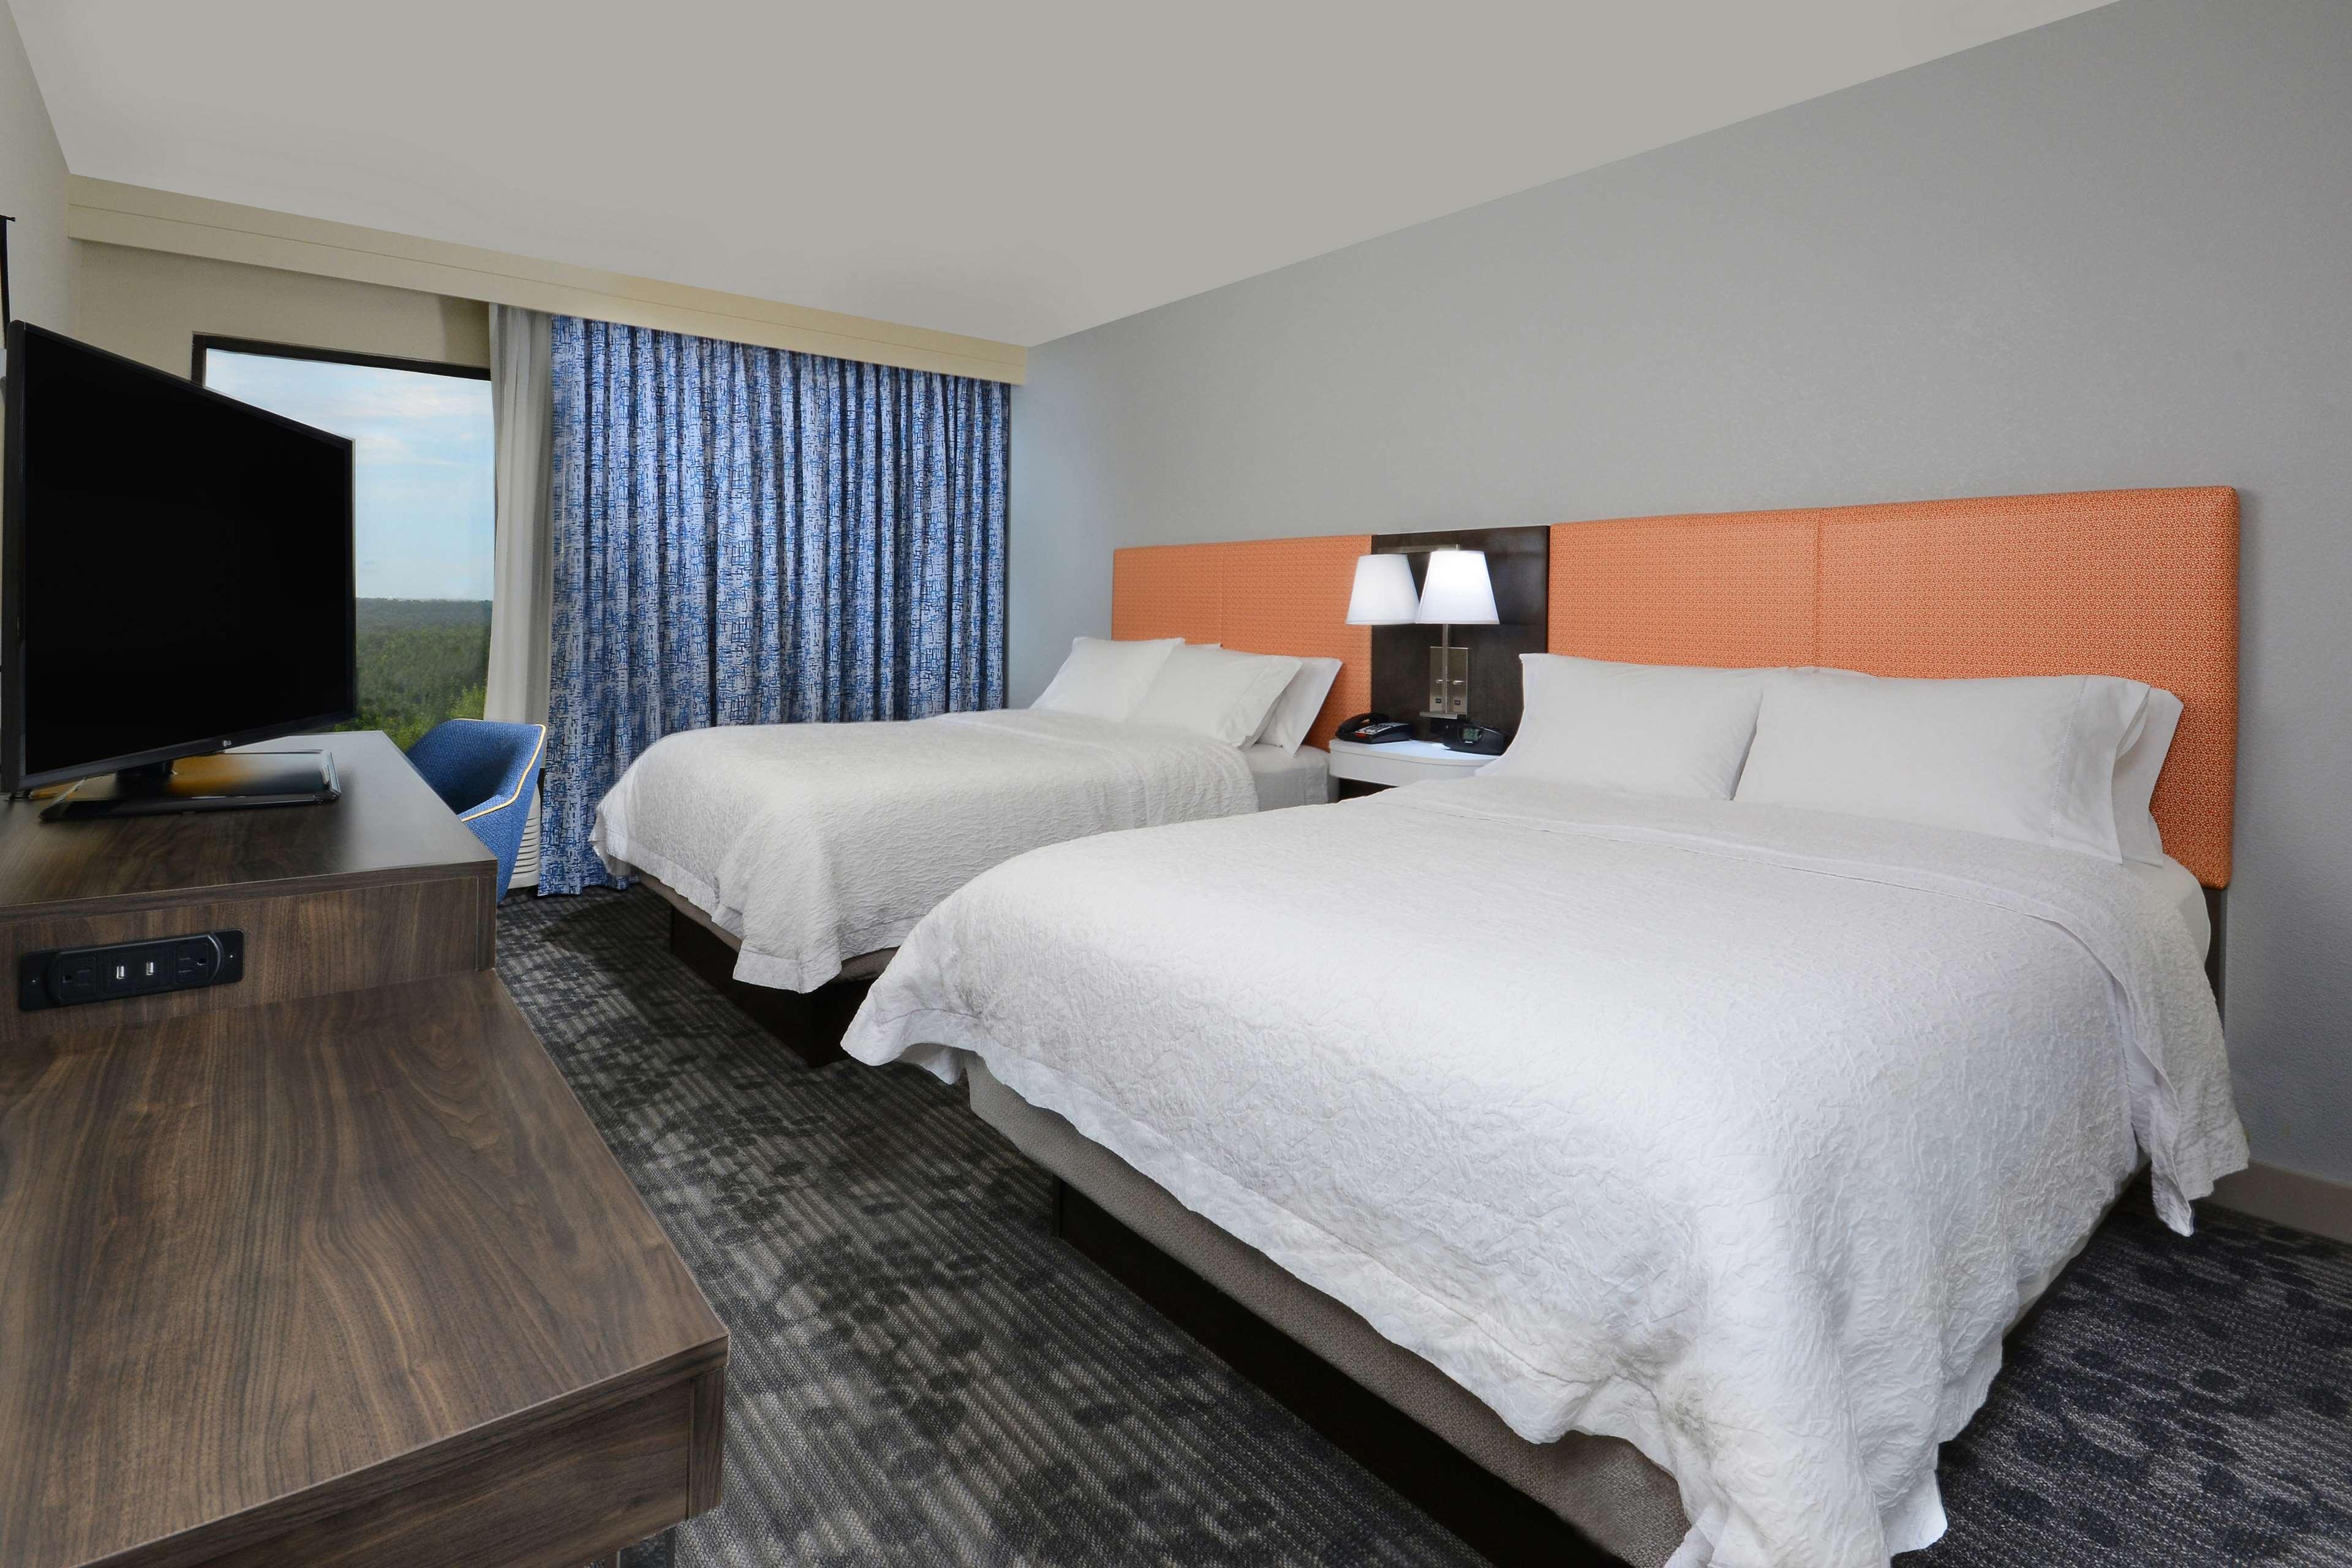 Hampton Inn & Suites Greenville/Spartanburg I-85 image 33